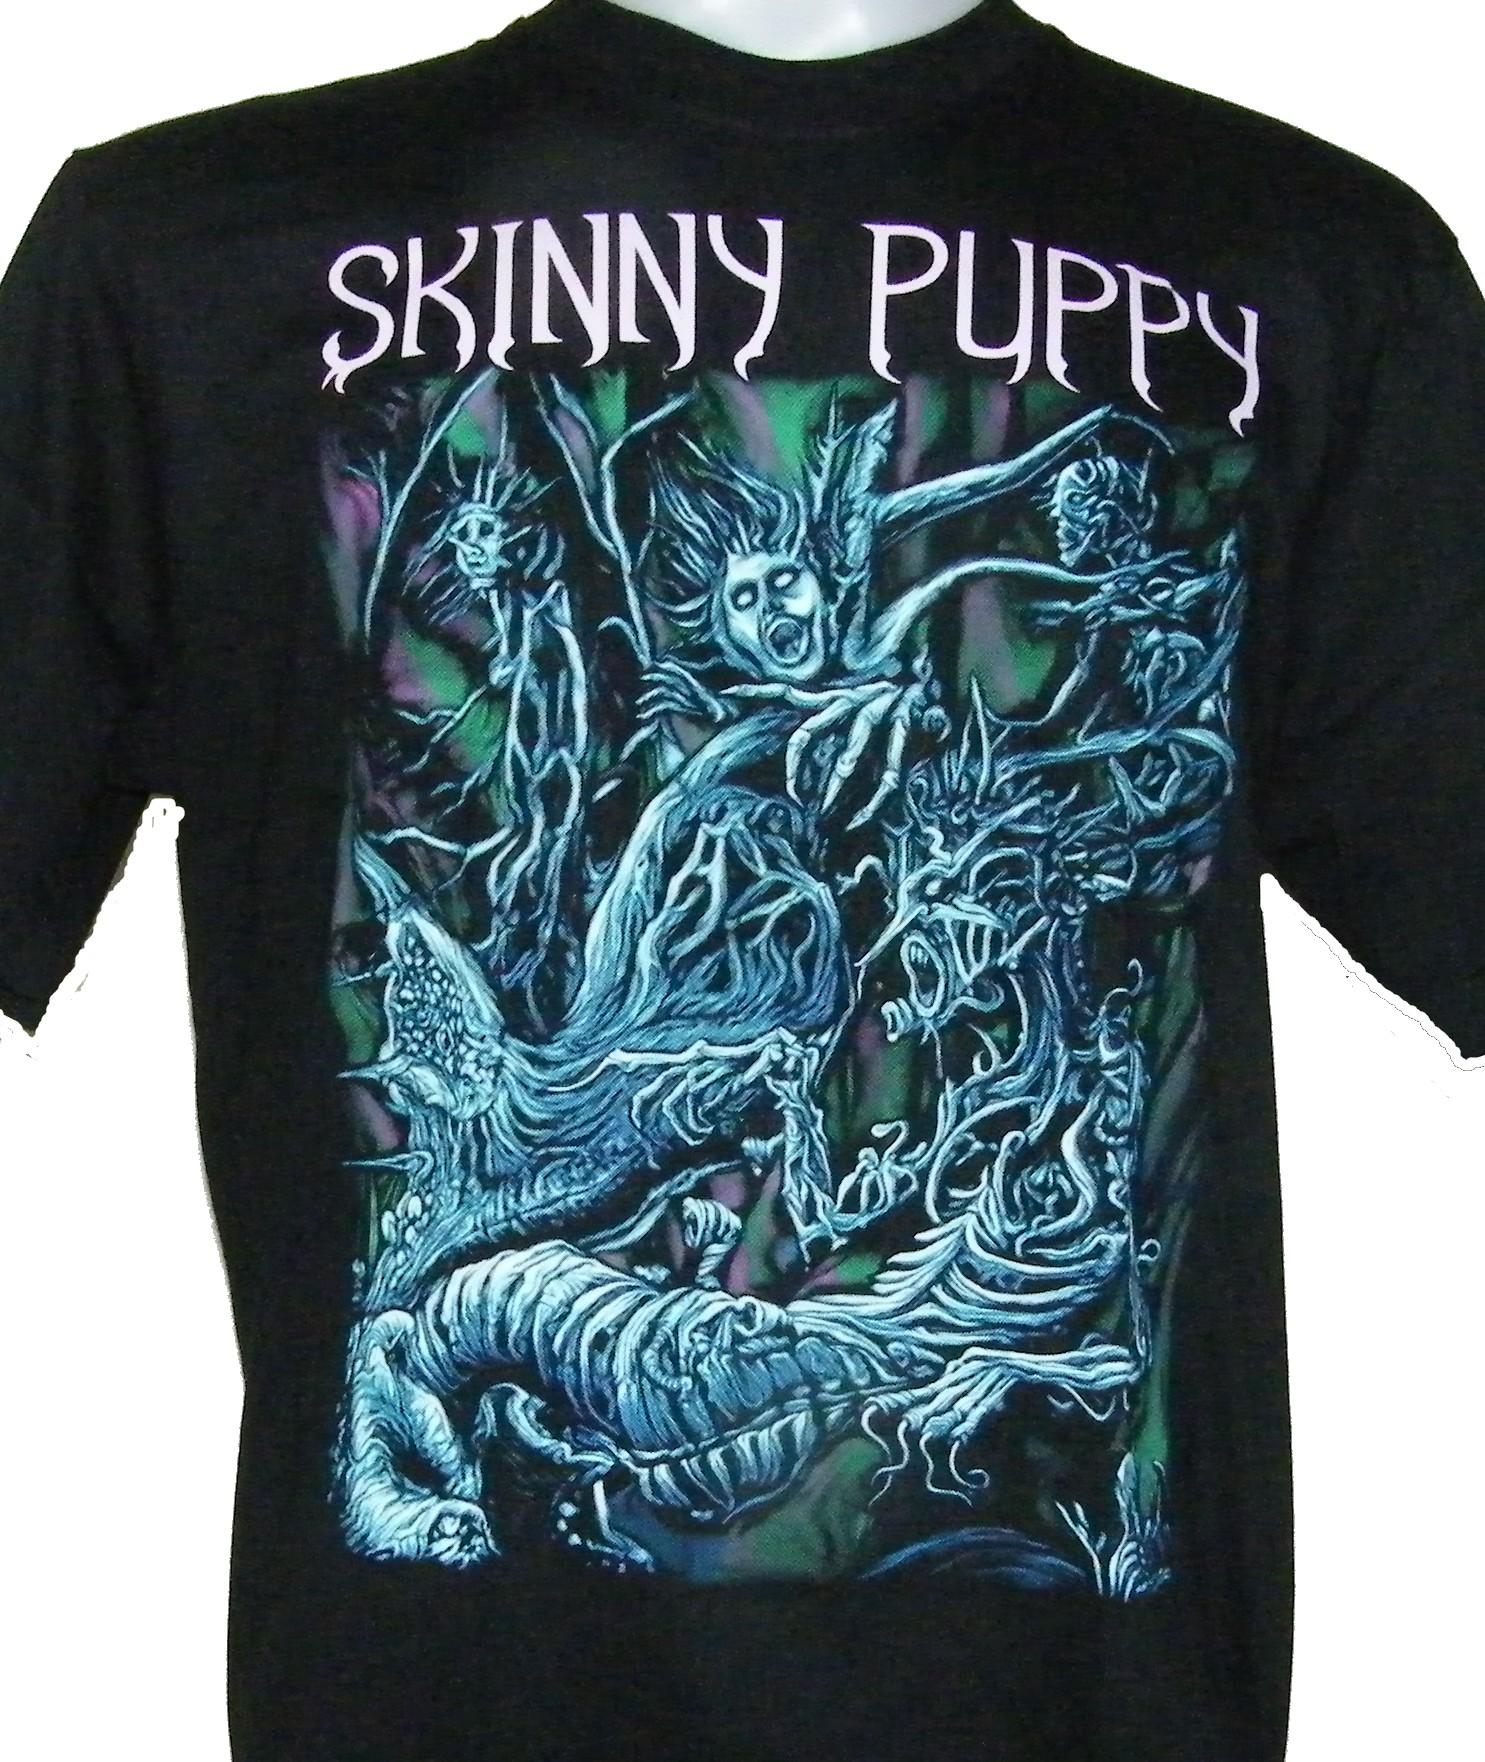 035d50697cbb Skinny Puppy t-shirt size XXXL – RoxxBKK